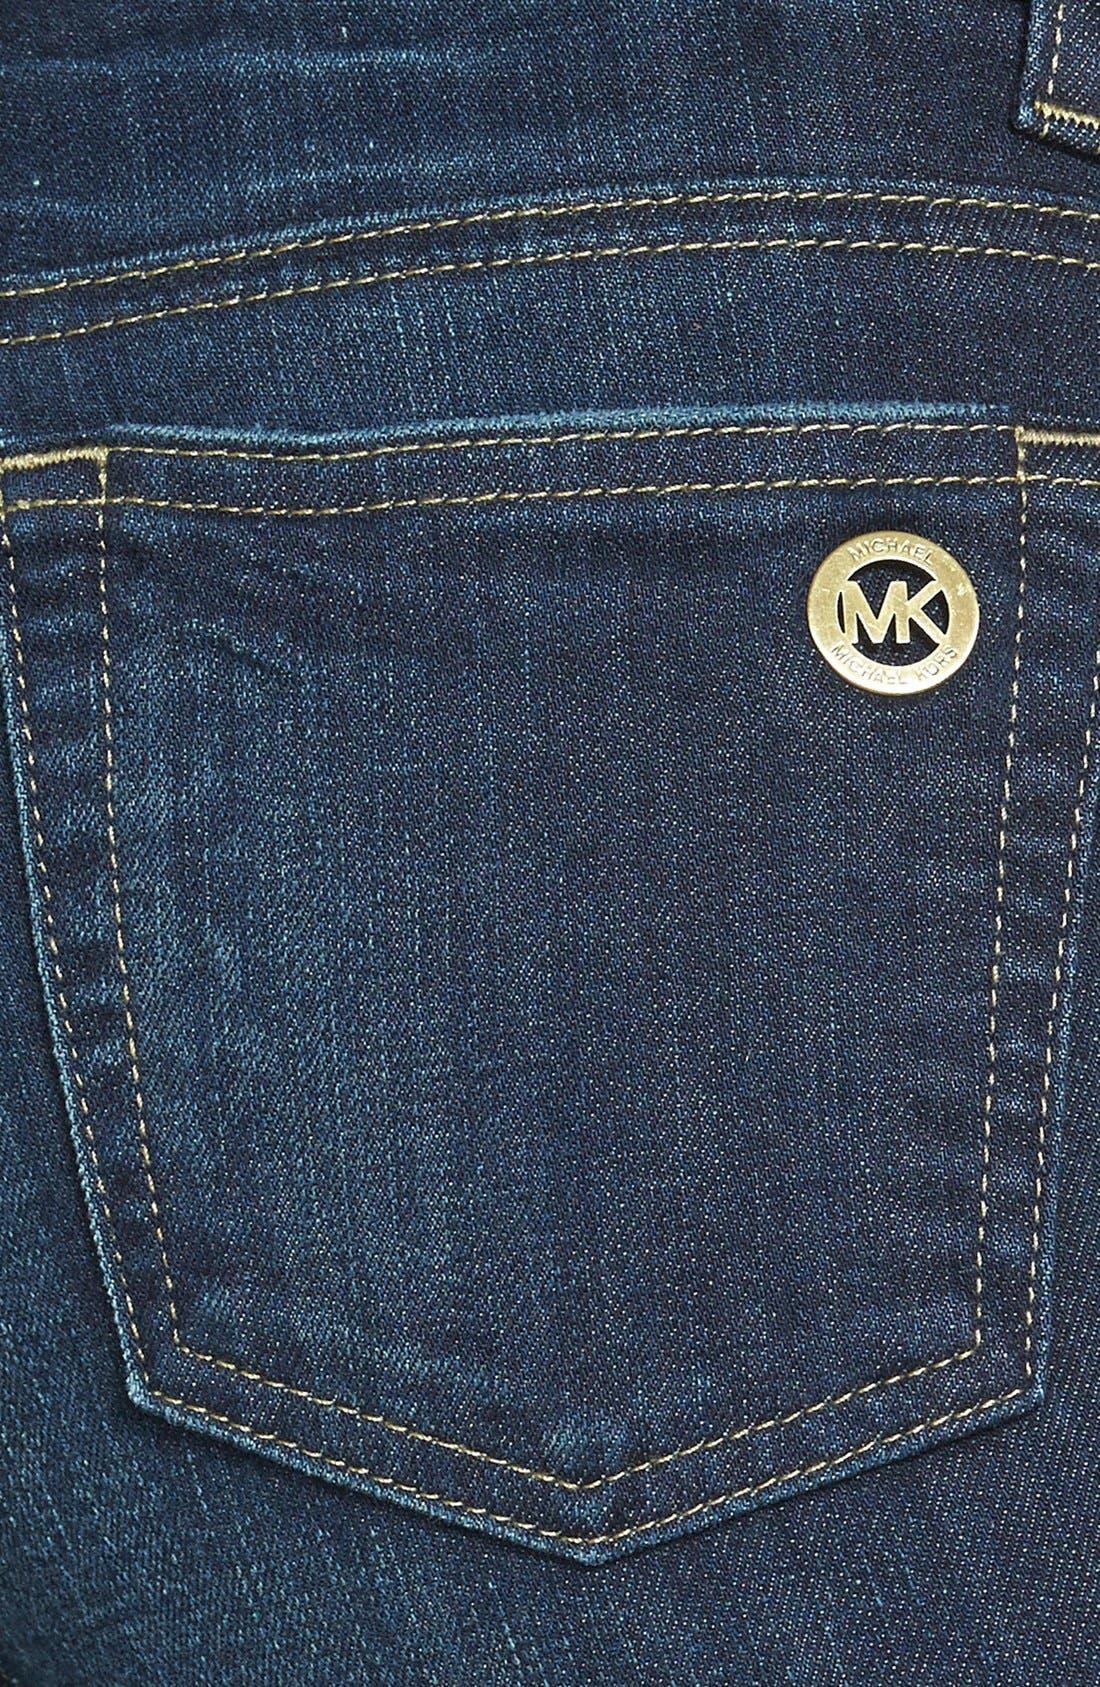 Alternate Image 3  - MICHAEL Michael Kors Zip Pocket Skinny Jeans (Veruschka) (Petite)